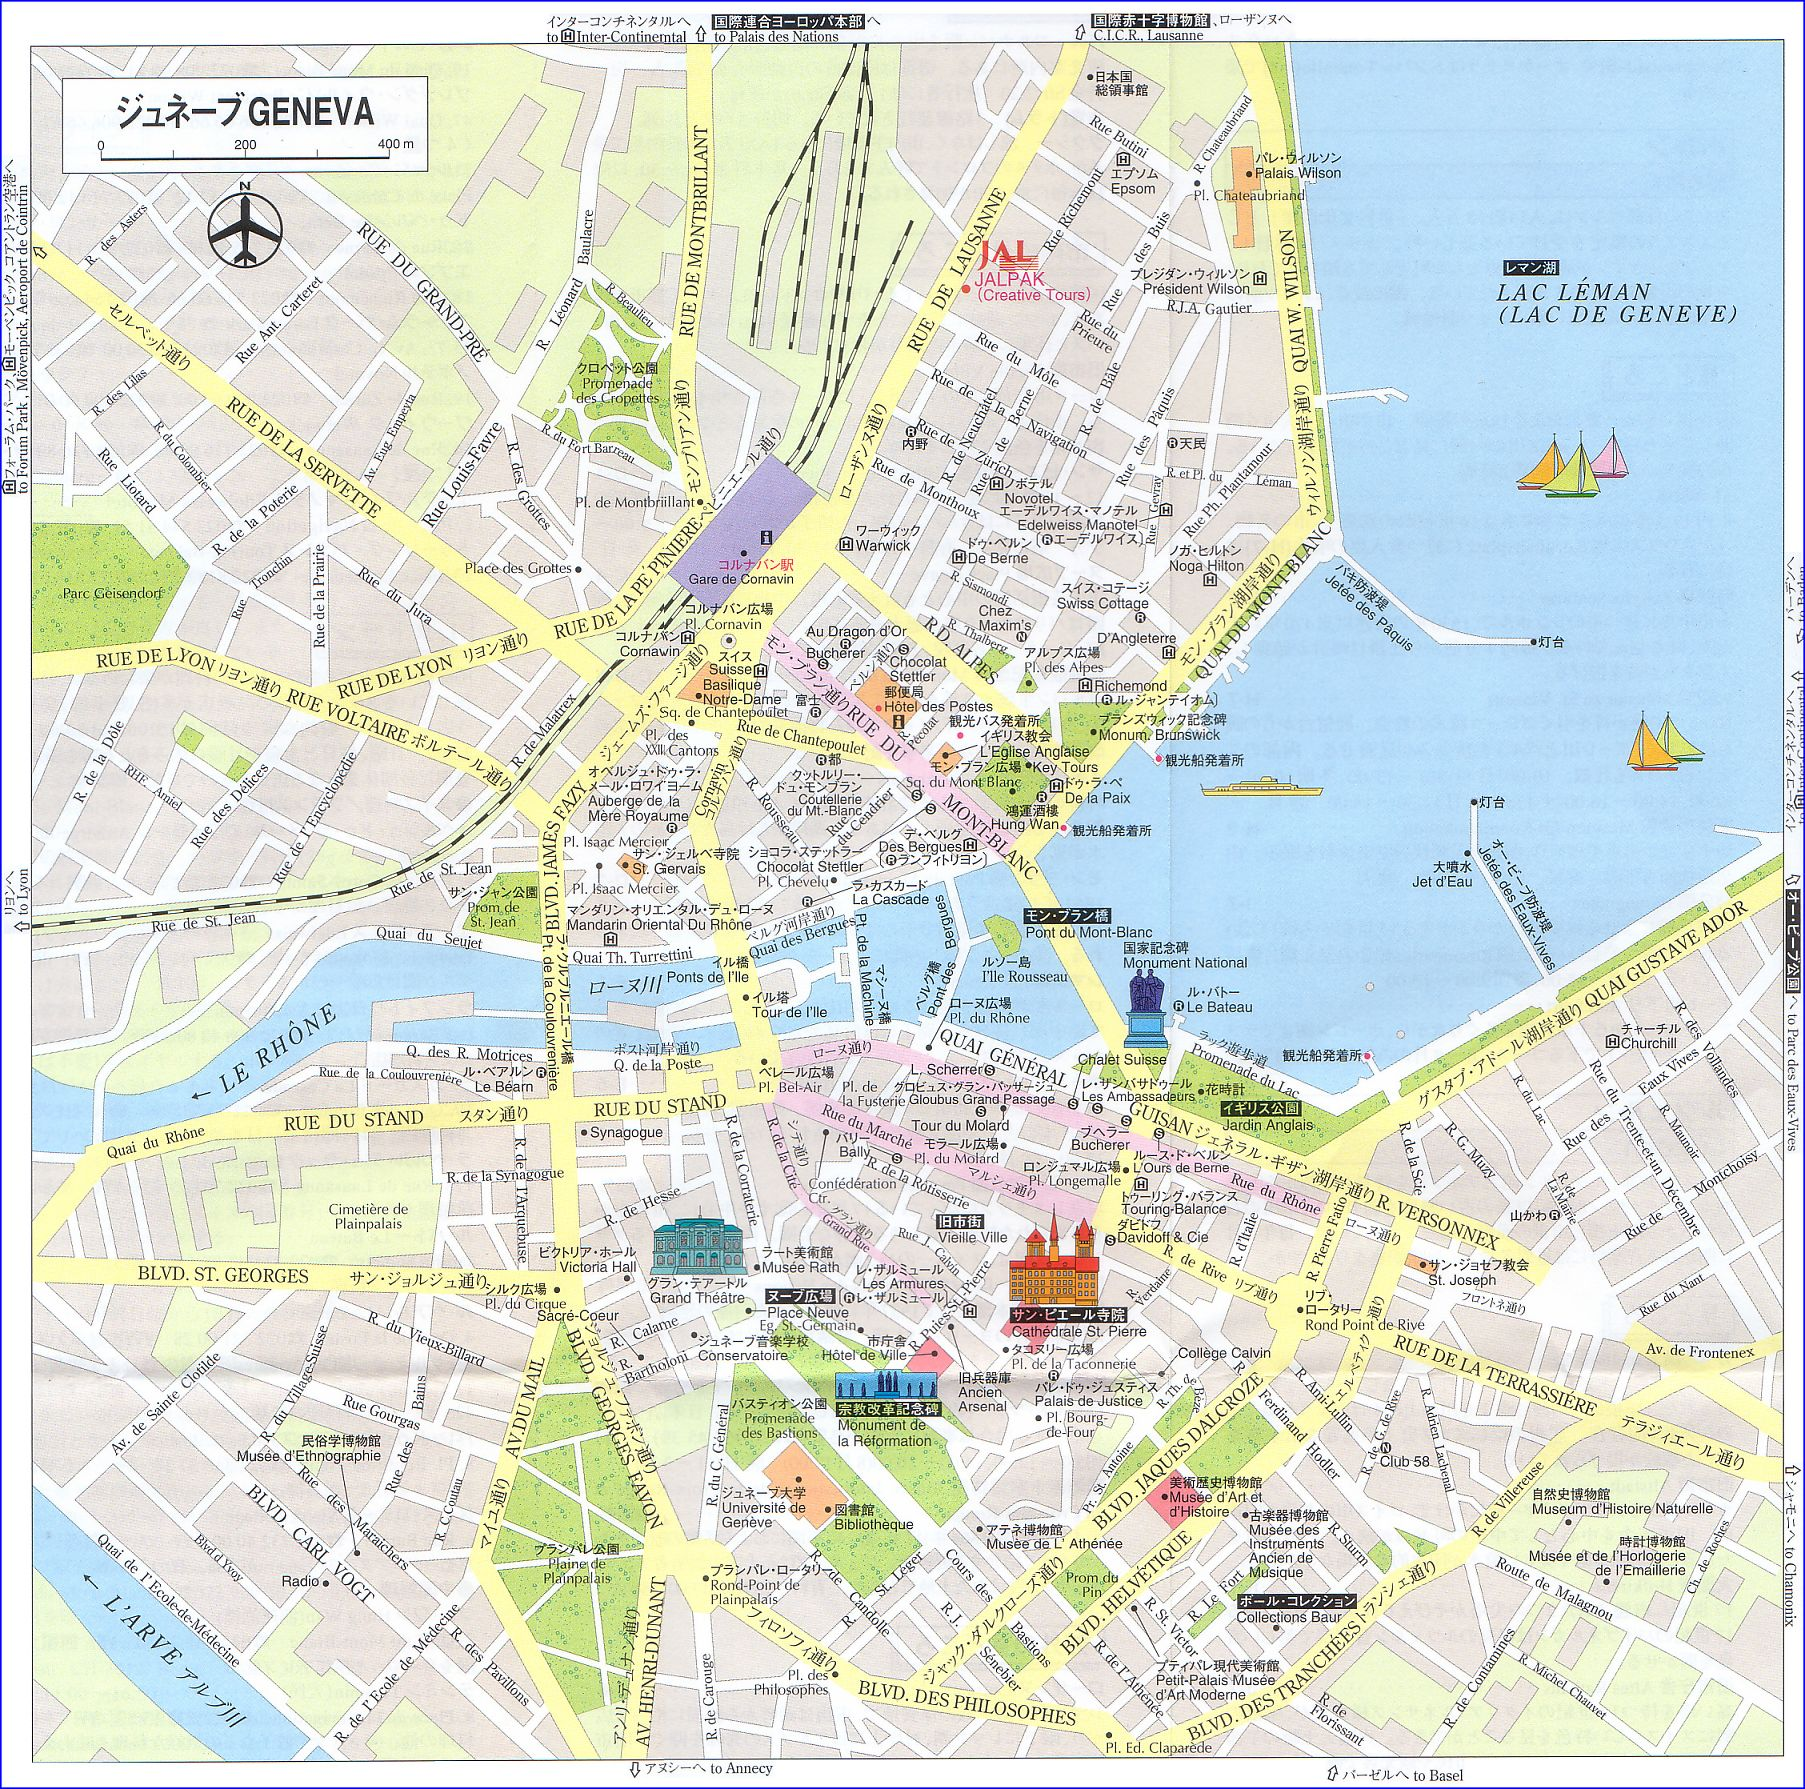 Lake Geneva Switzerland Map : 世界の山脈 地図 : すべての講義